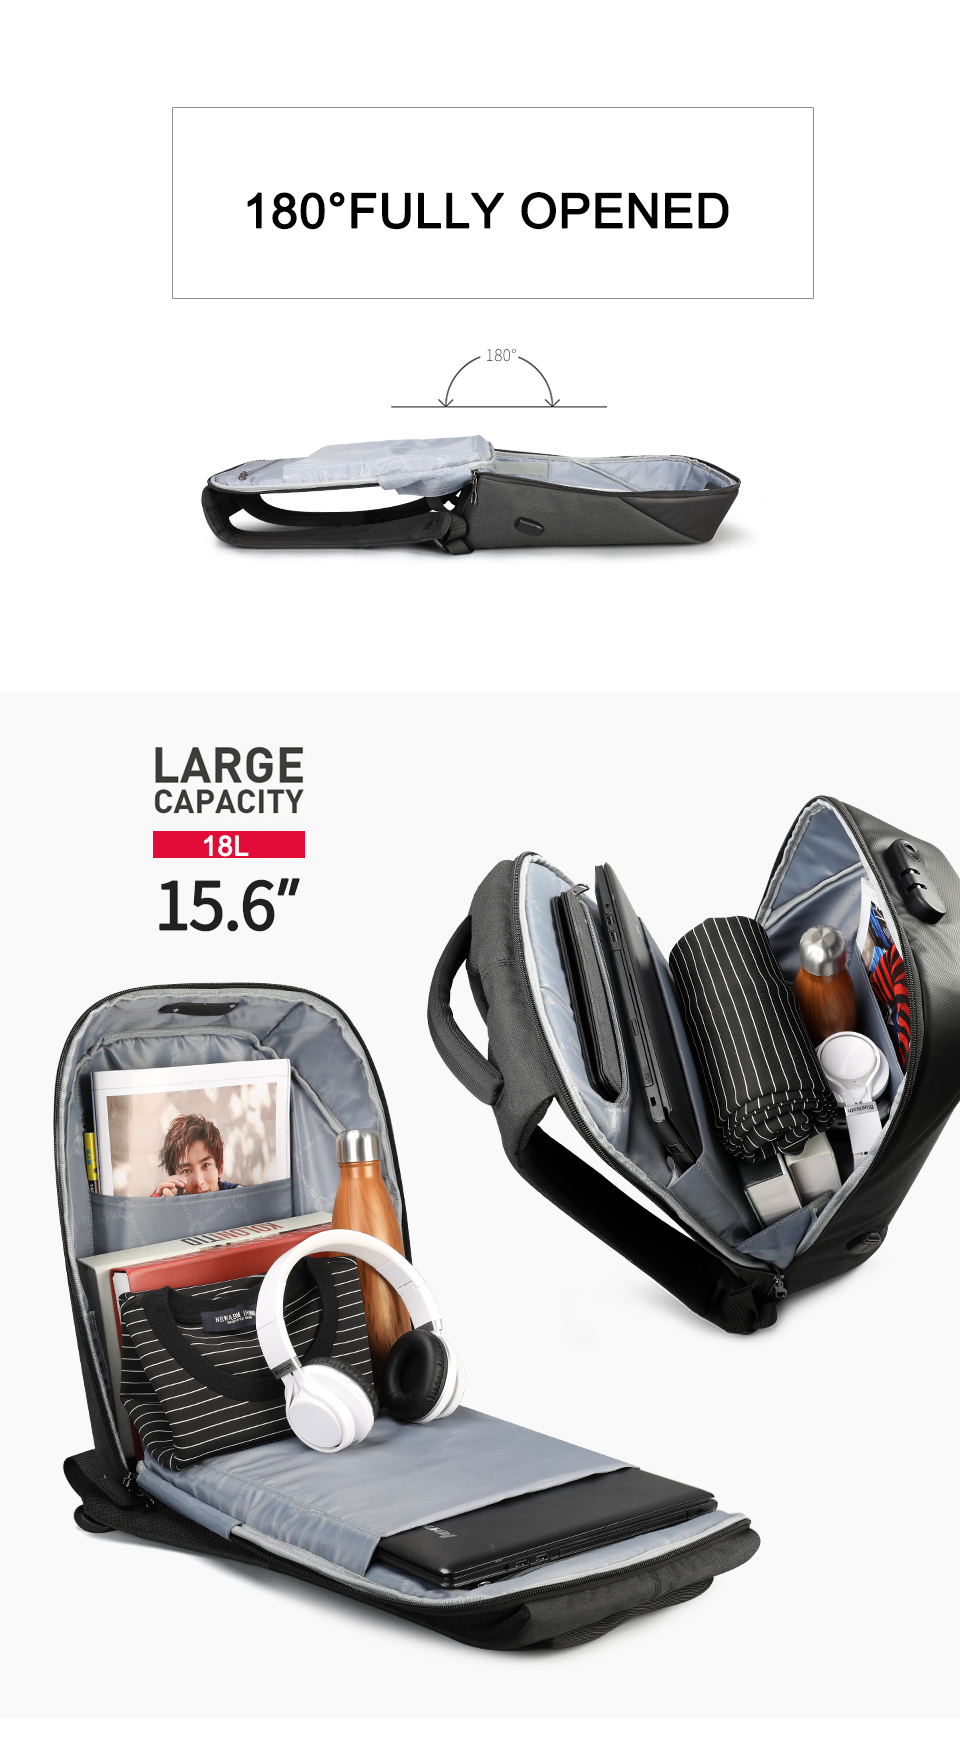 HTB1KvX3DFmWBuNjSspdq6zugXXaG Tigernu Women Anti Theft TSA Lock female Laptop Backpack USB Charge School Bag for Teenager girls Feminine Backpacks Bagpack